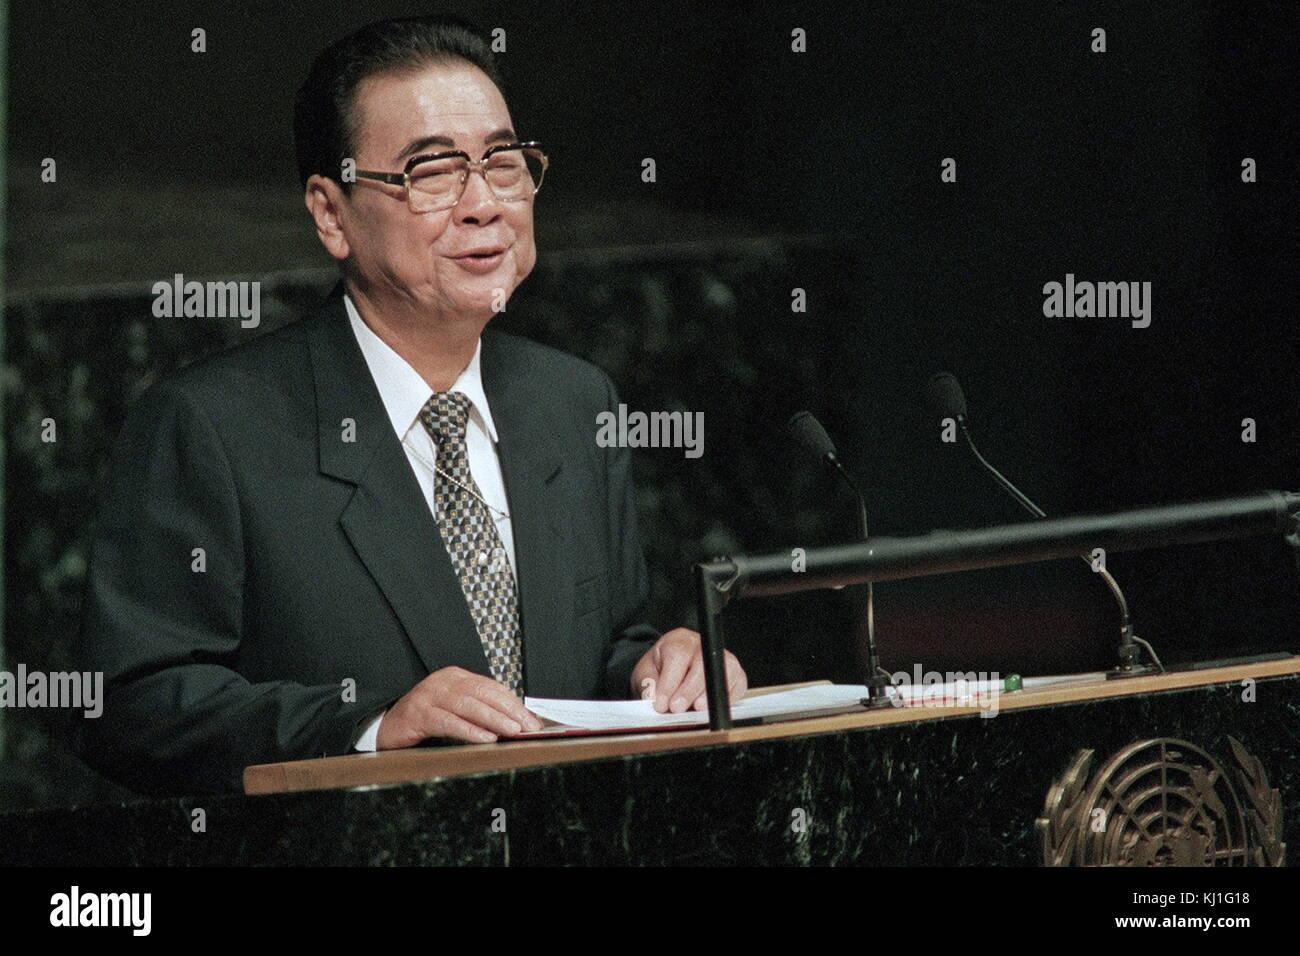 Li Peng (born 1928) Premier of the People's Republic of China, between 1987